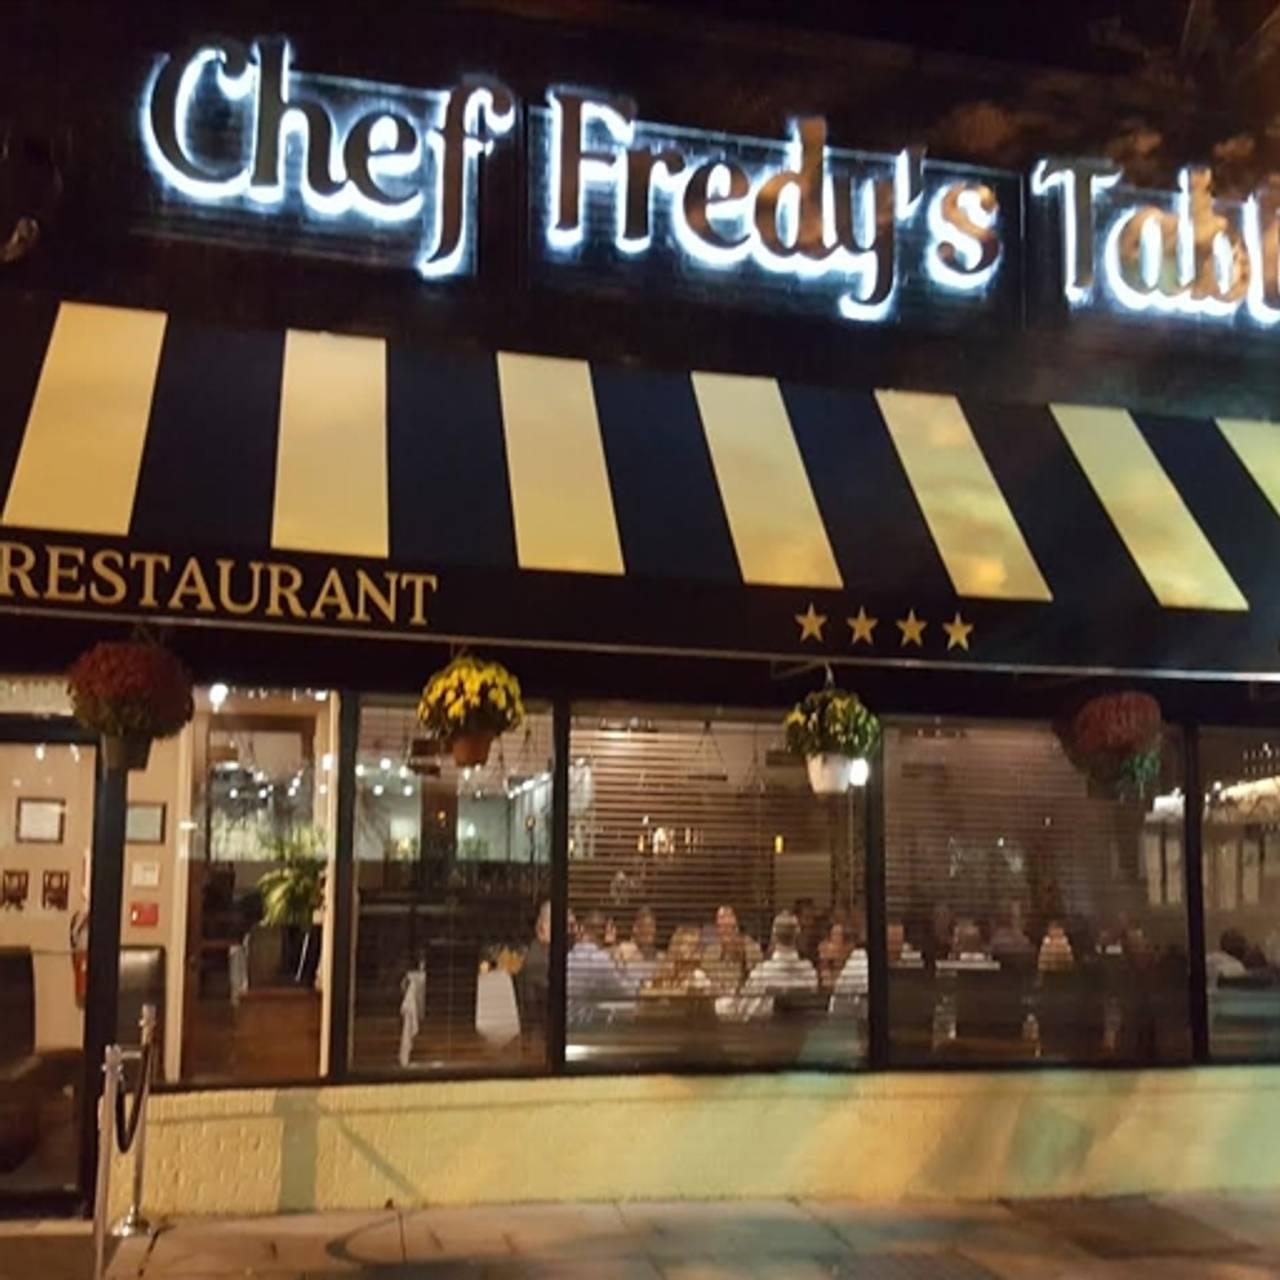 chef fredy s table restaurant morristown nj opentable rh opentable com